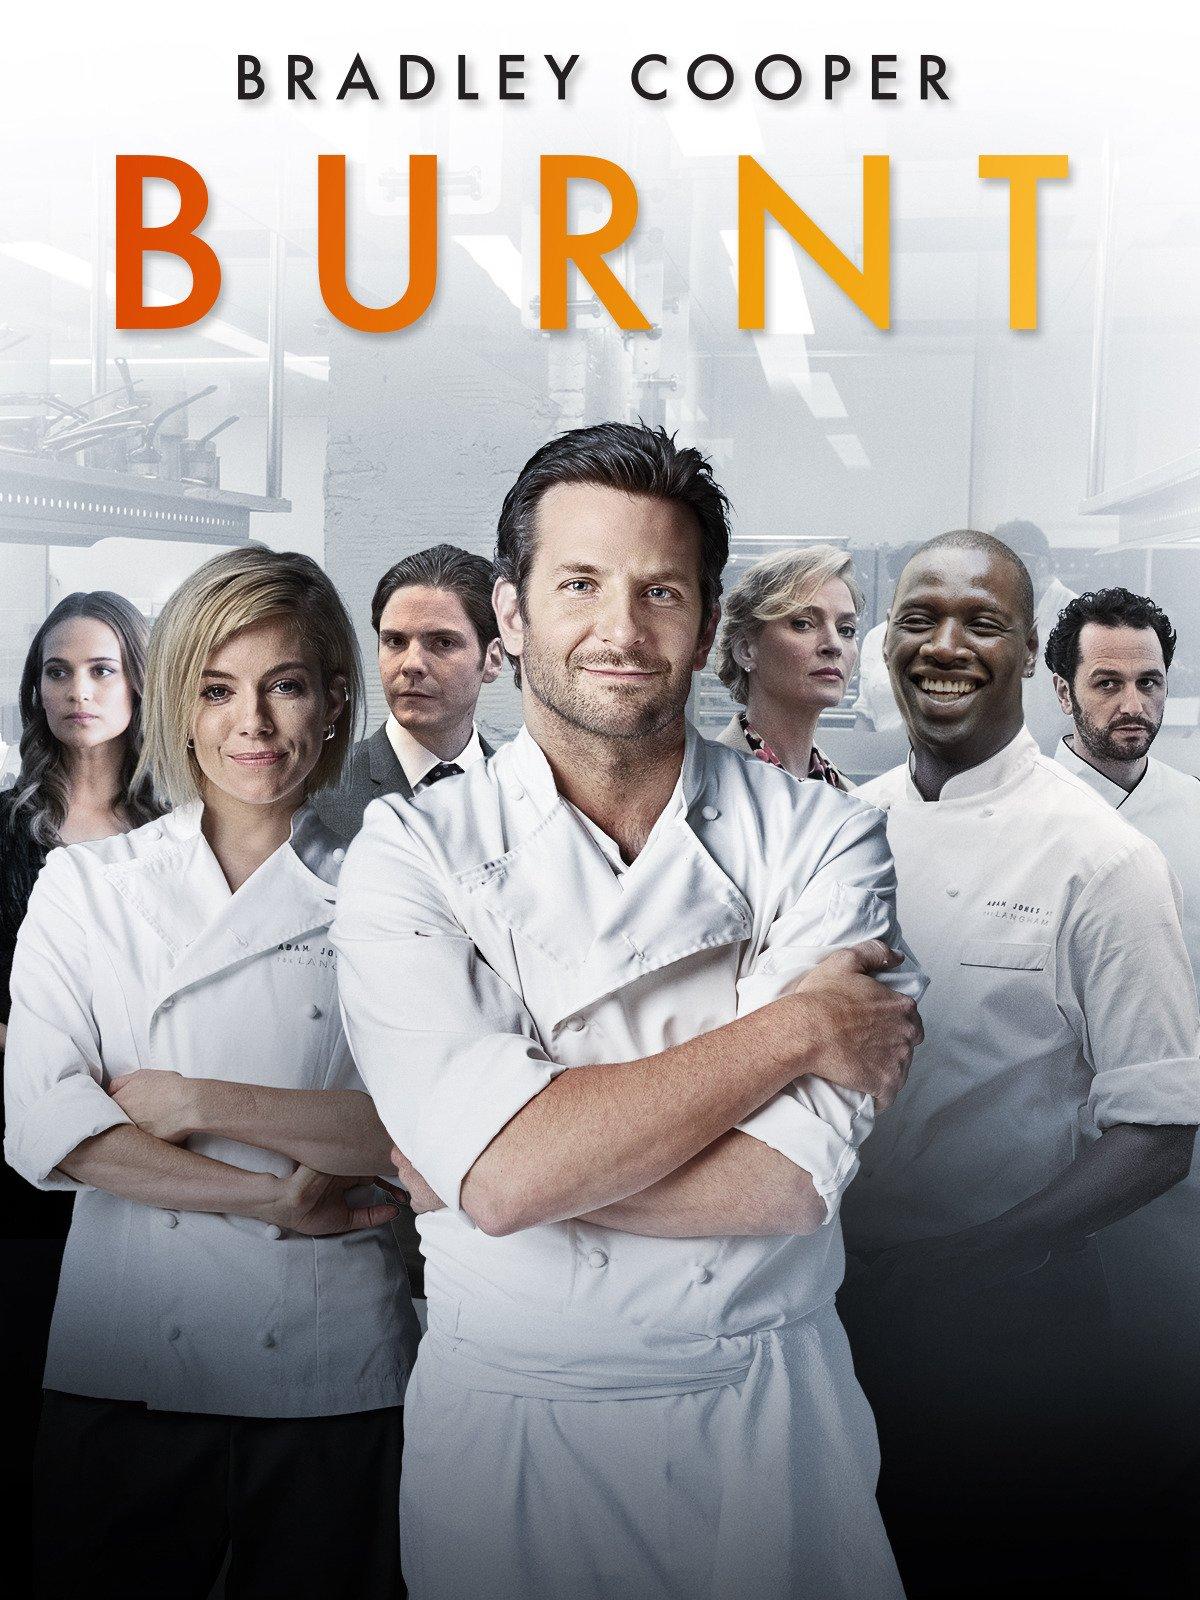 burnt full movie in hindi download